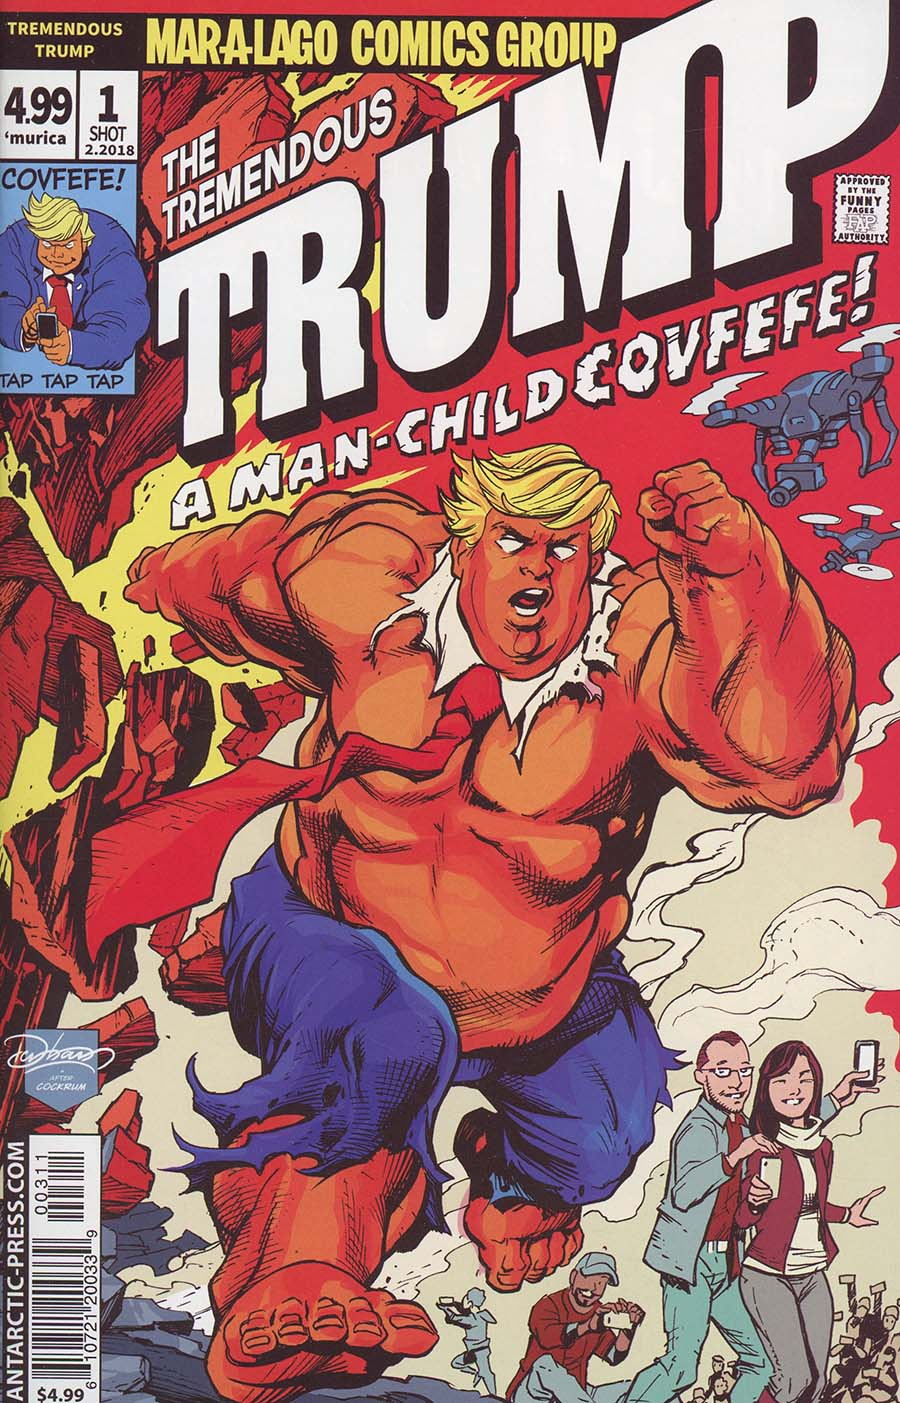 Tremendous Trump A Man-Child Covfefe One Shot Cover A Regular Brian Denham Cover